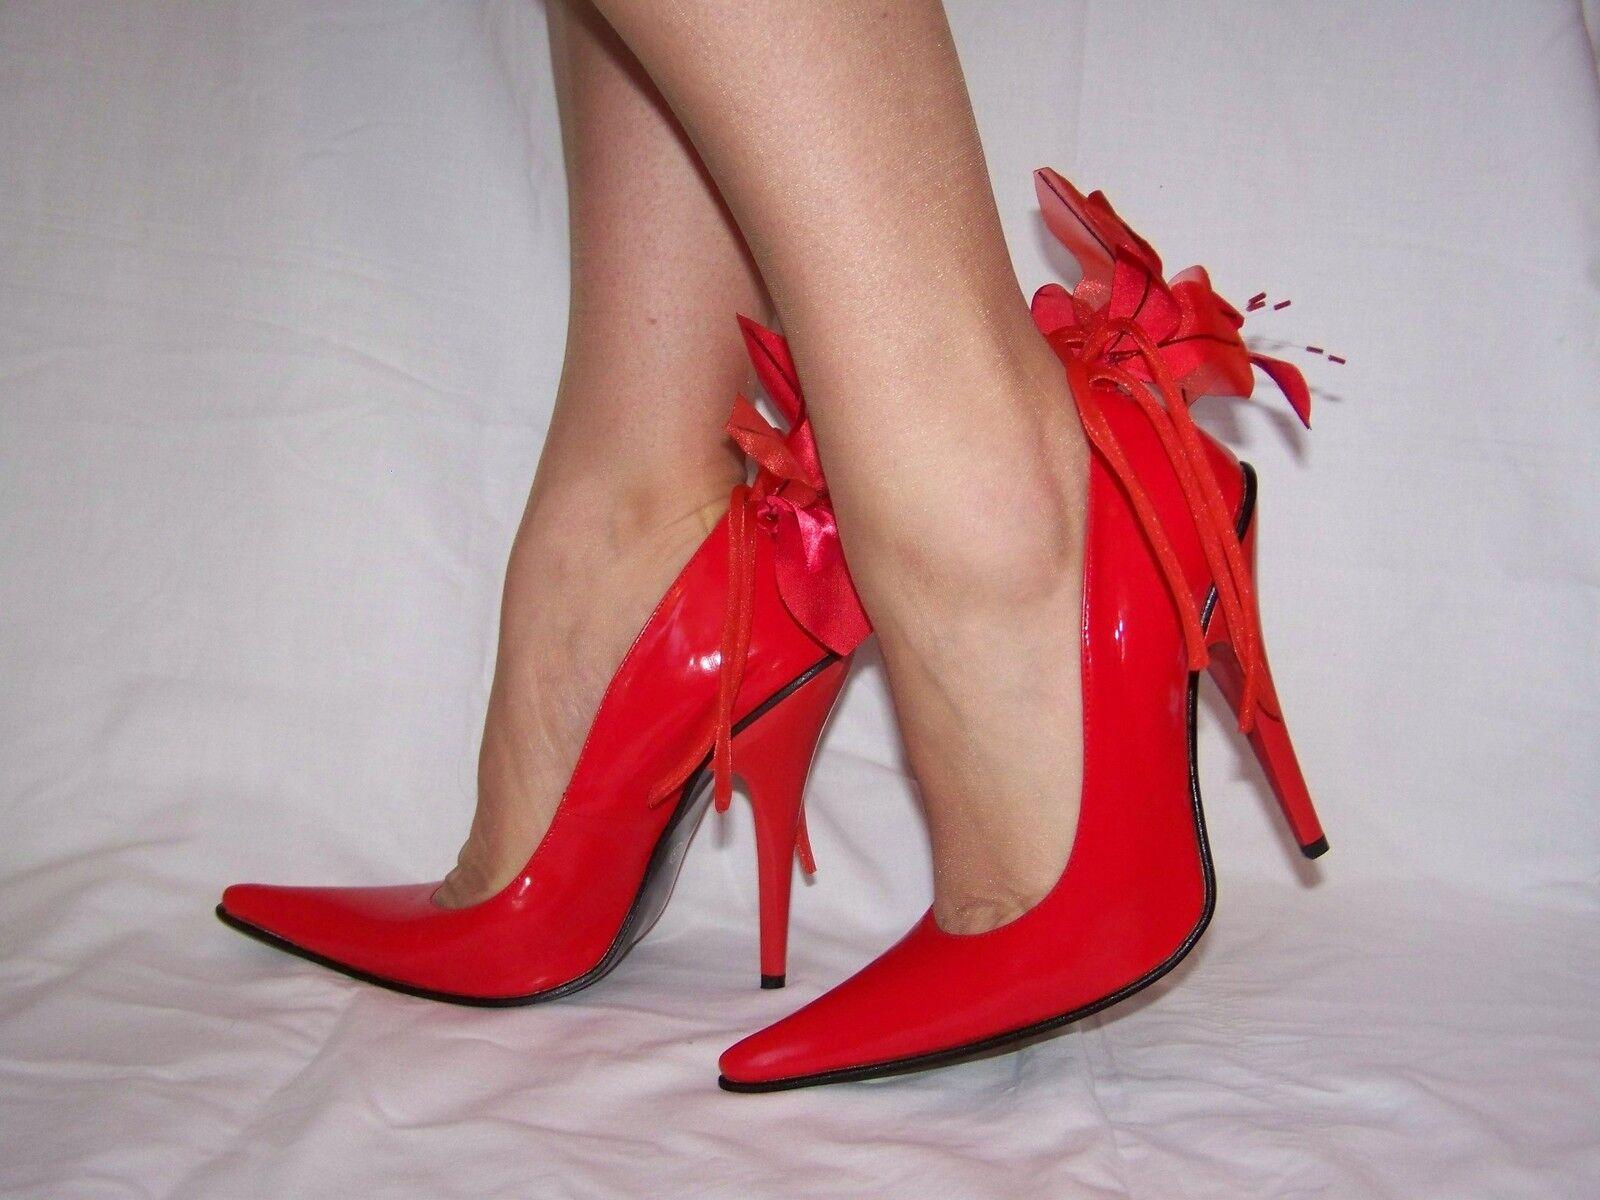 High heels, pumps 36 37 38 39 40 41 42 43 44 45 46 47 Bolingier FS576